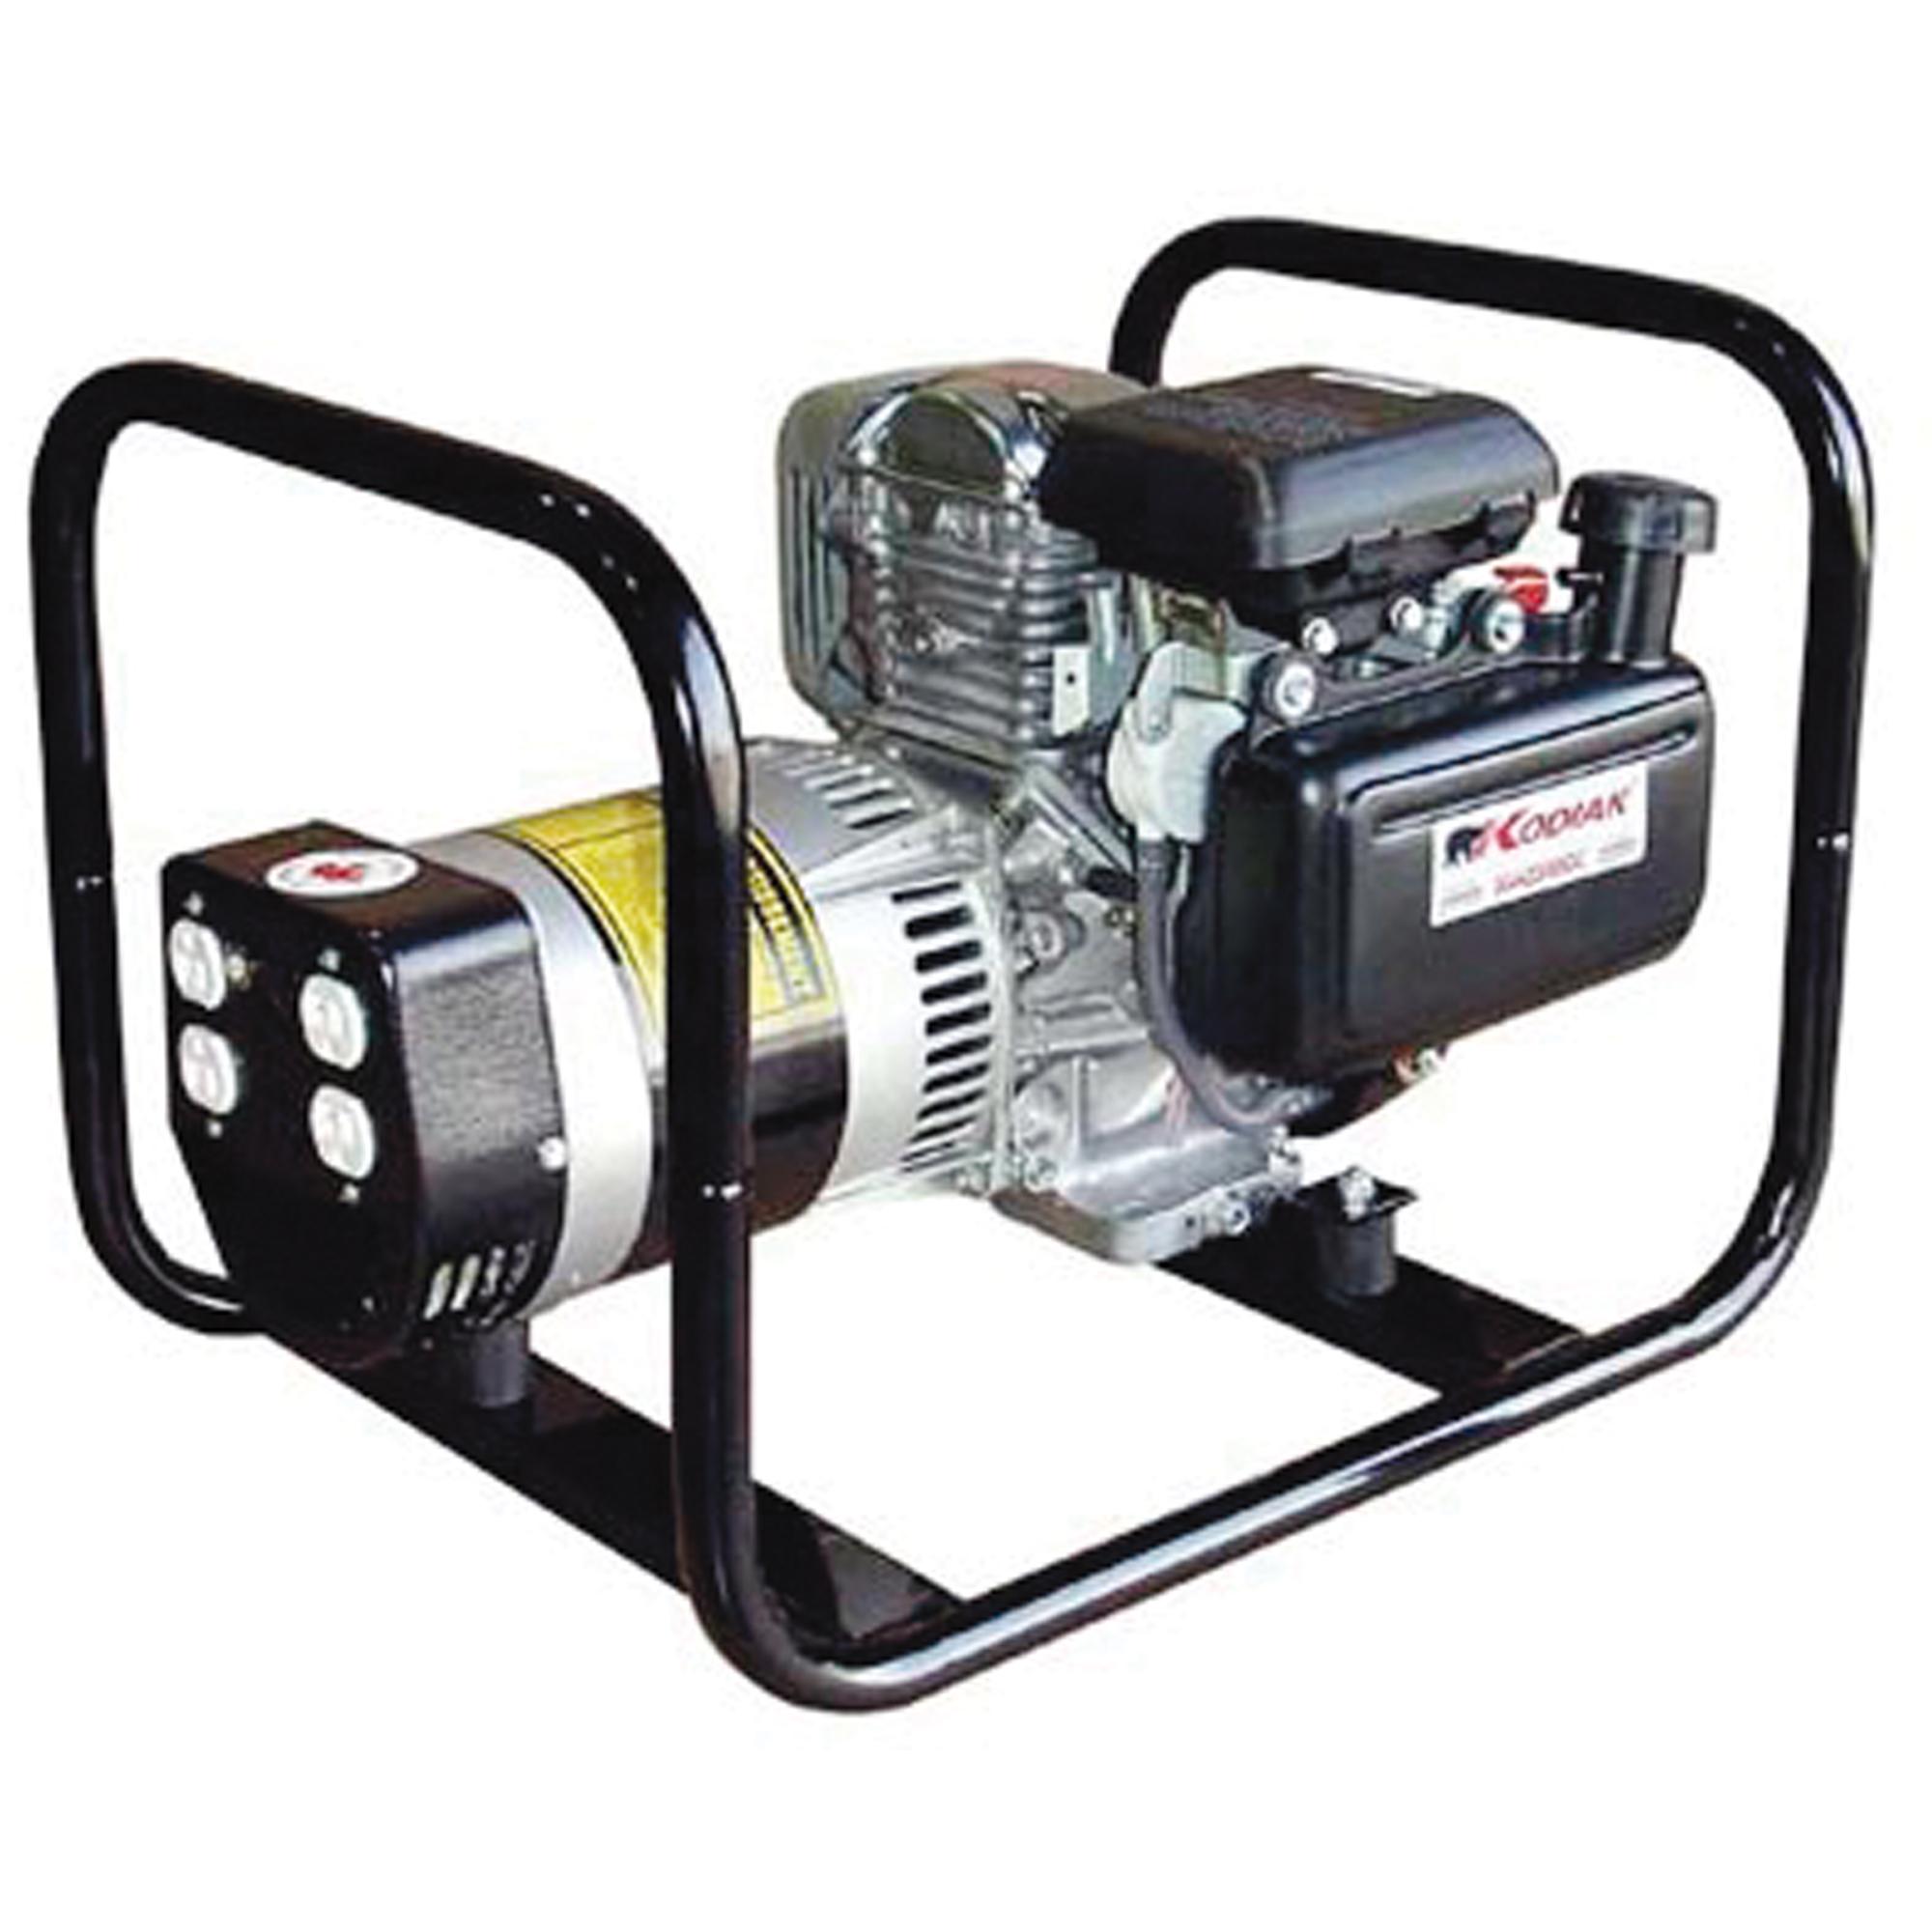 Sga Series Honda Motor Portable Generators 2300 W Max